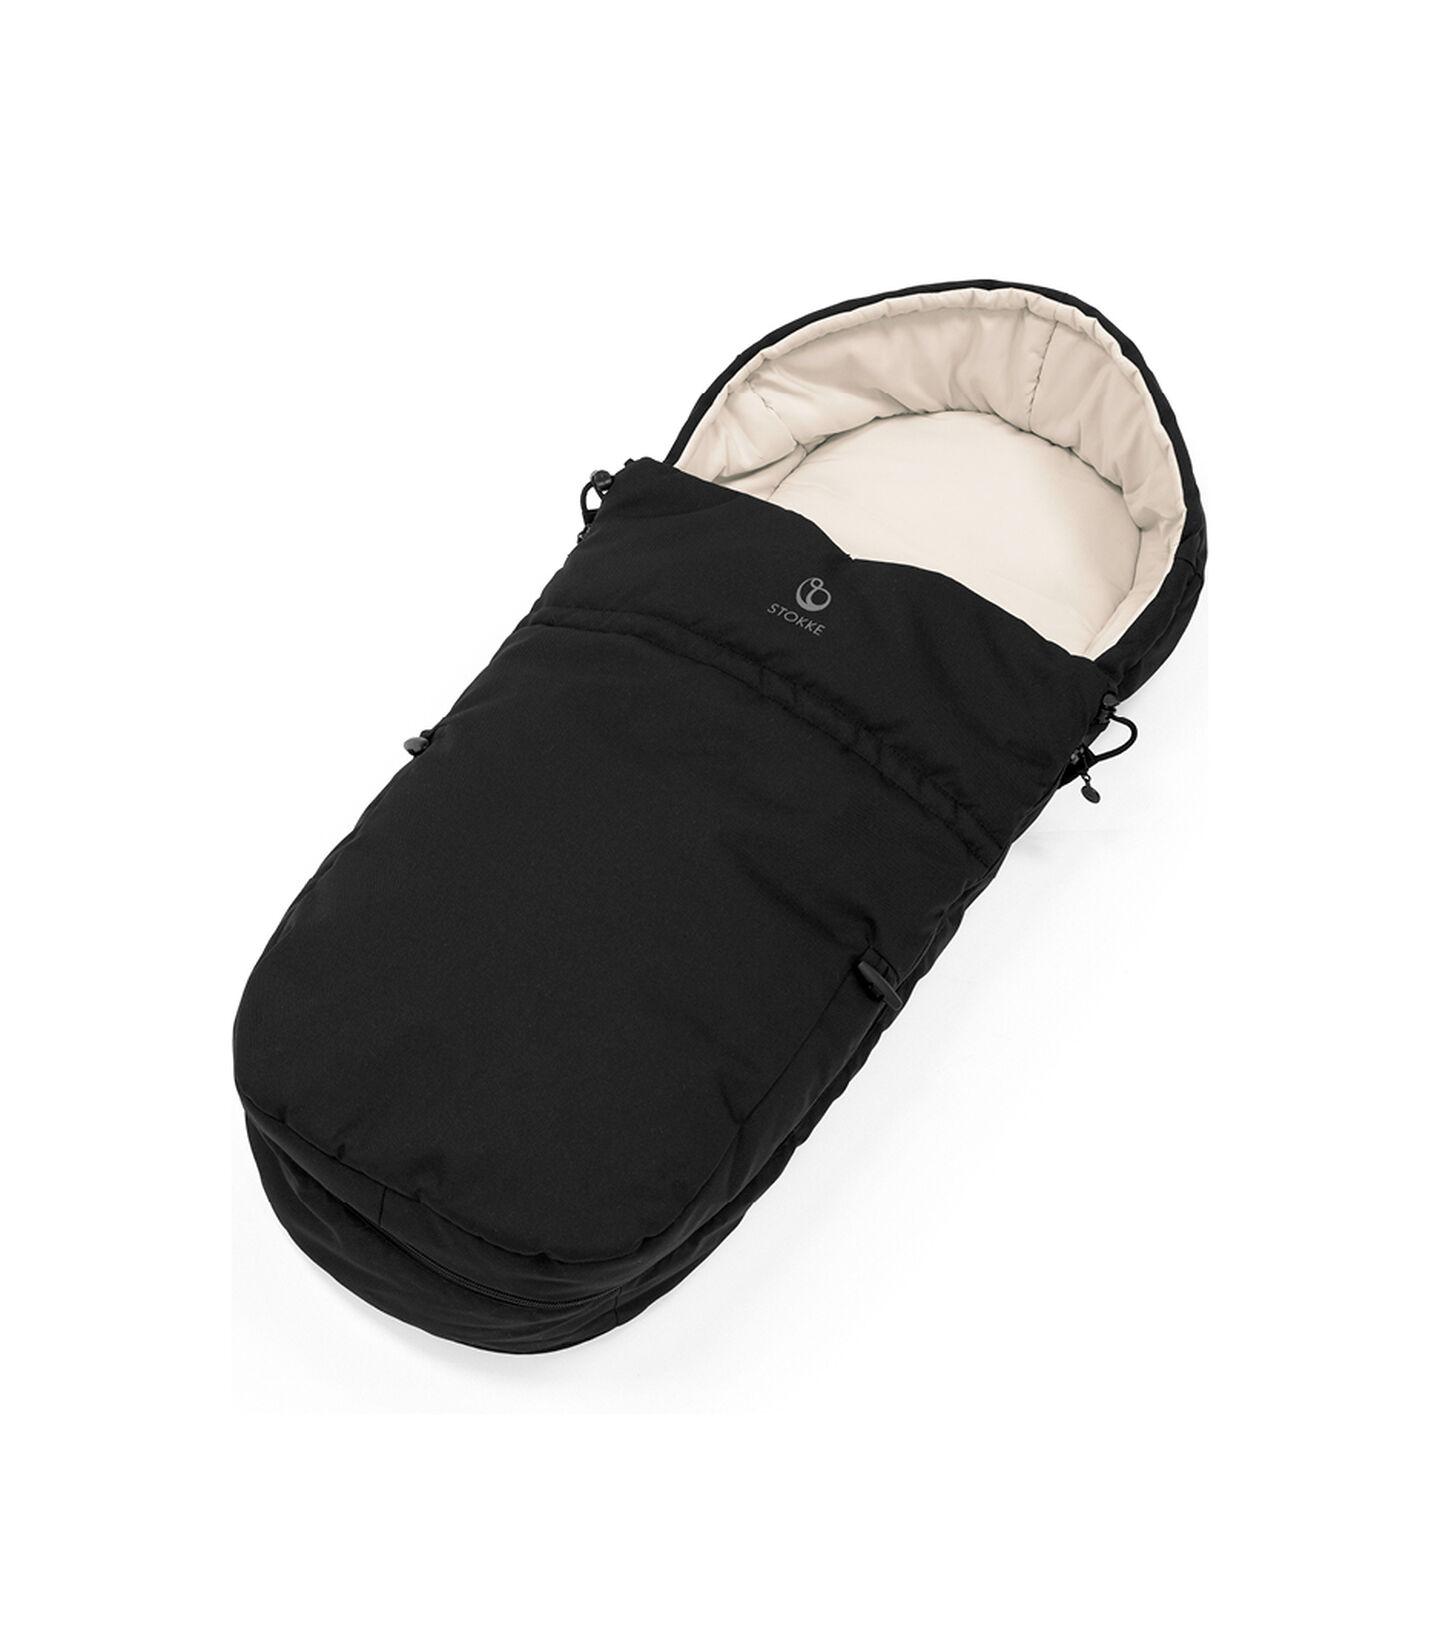 Stokke® Beat™ Soft Bag. Black. view 1